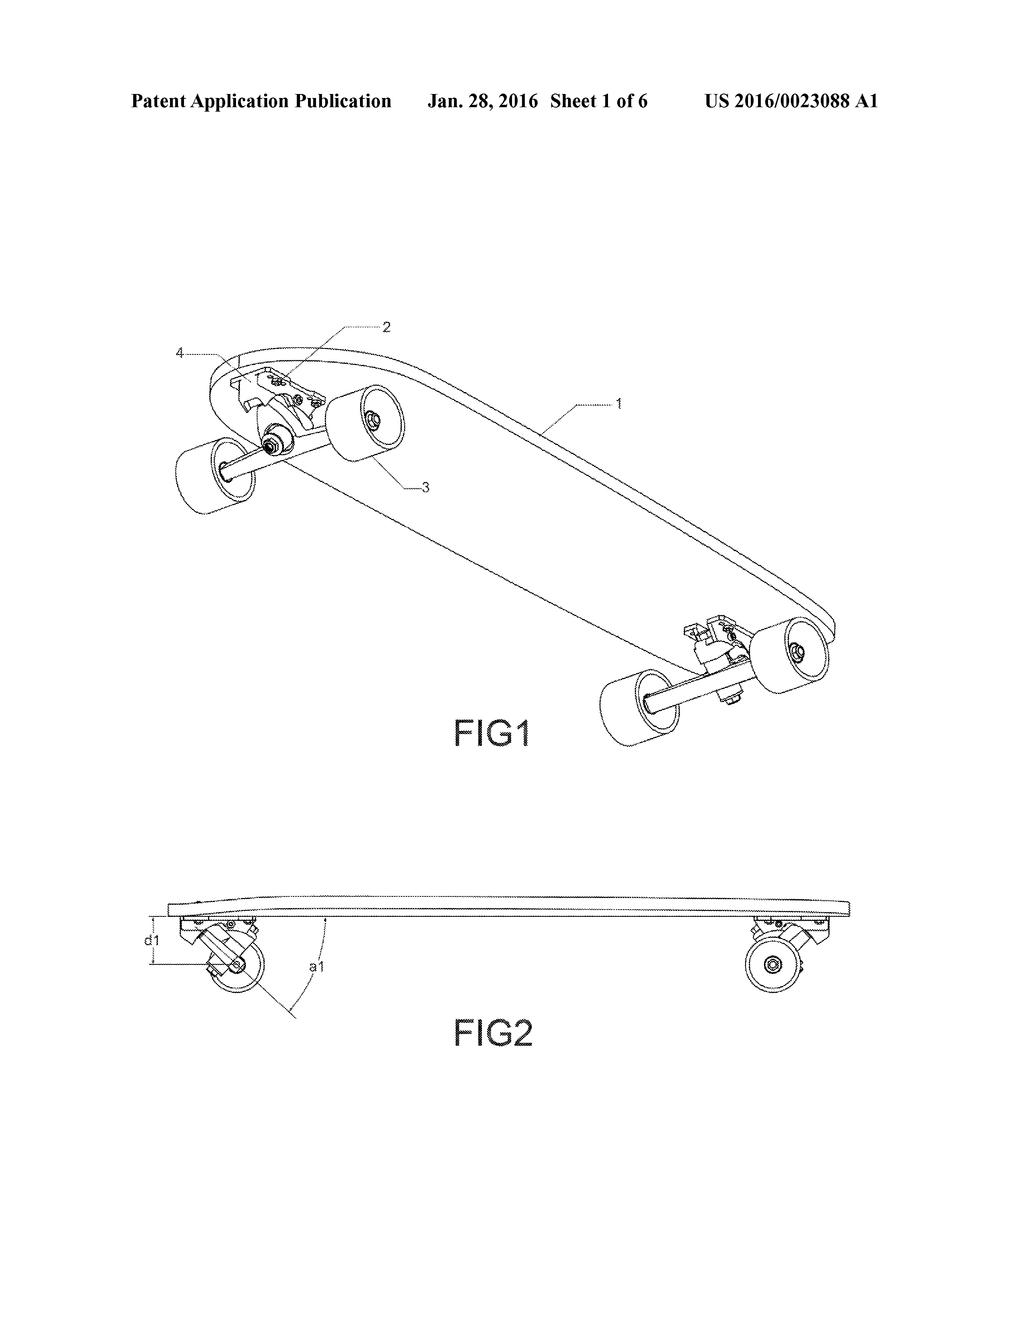 Longboards Kingpin Diagram Modern Design Of Wiring Skateboard Parts Adjustable Base For Longboard Reverse Trucks Rh Patentsencyclopedia Com Templates